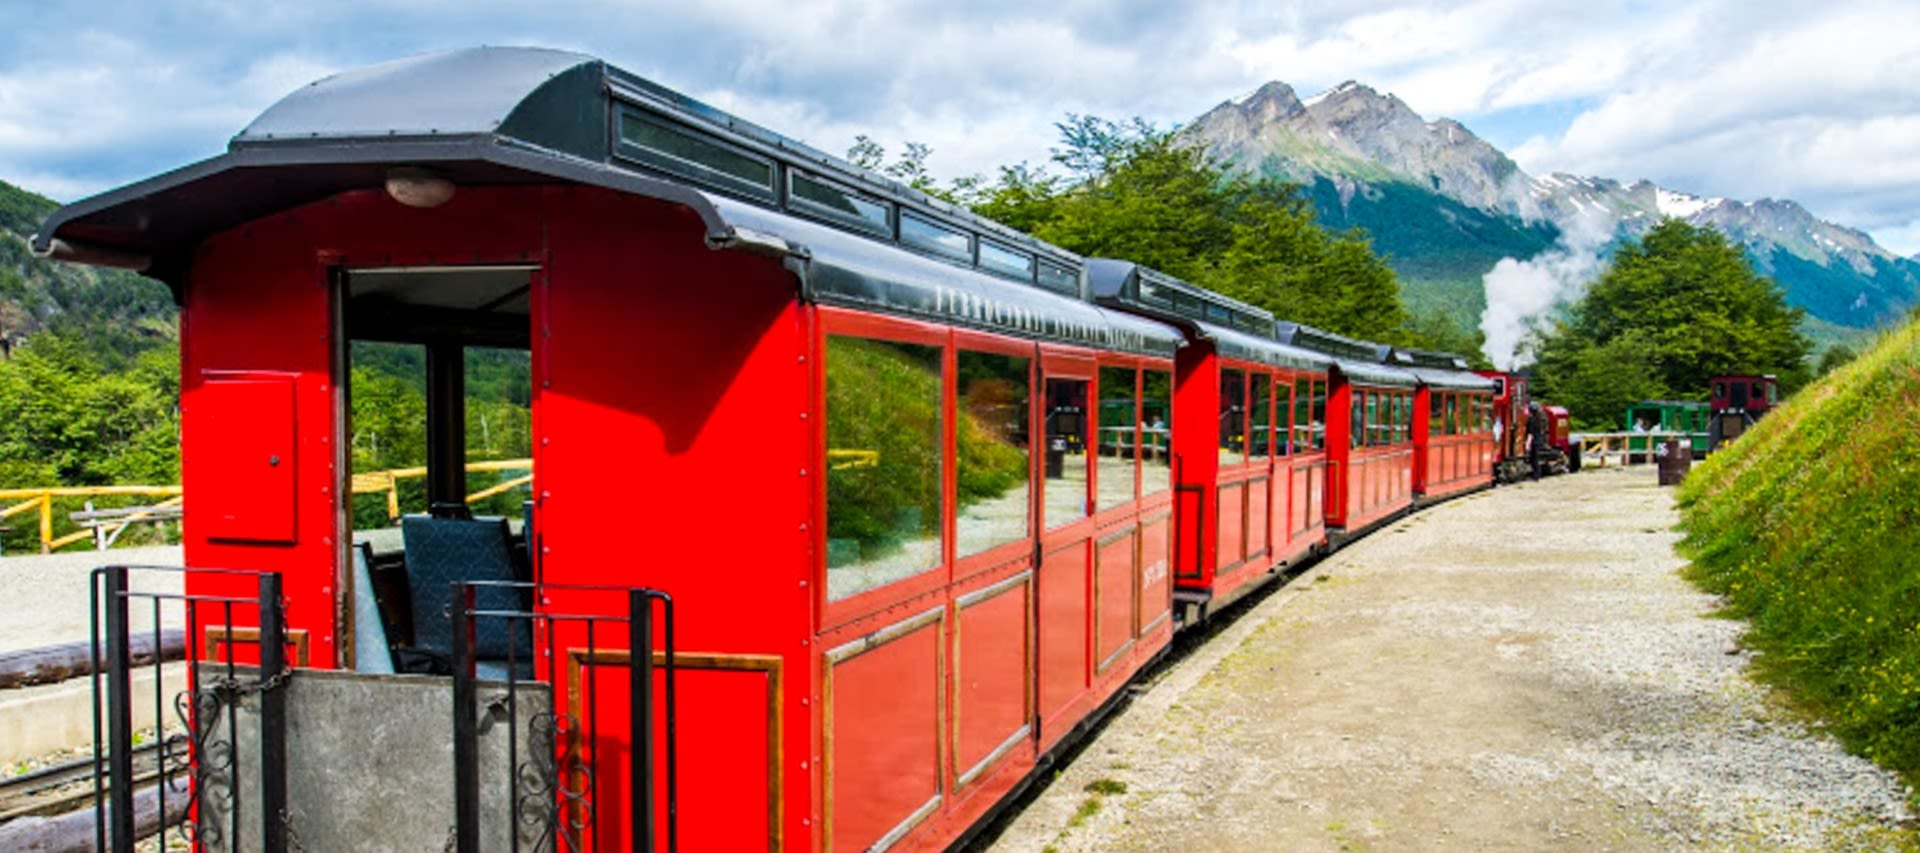 Red train near Patagonia mountains